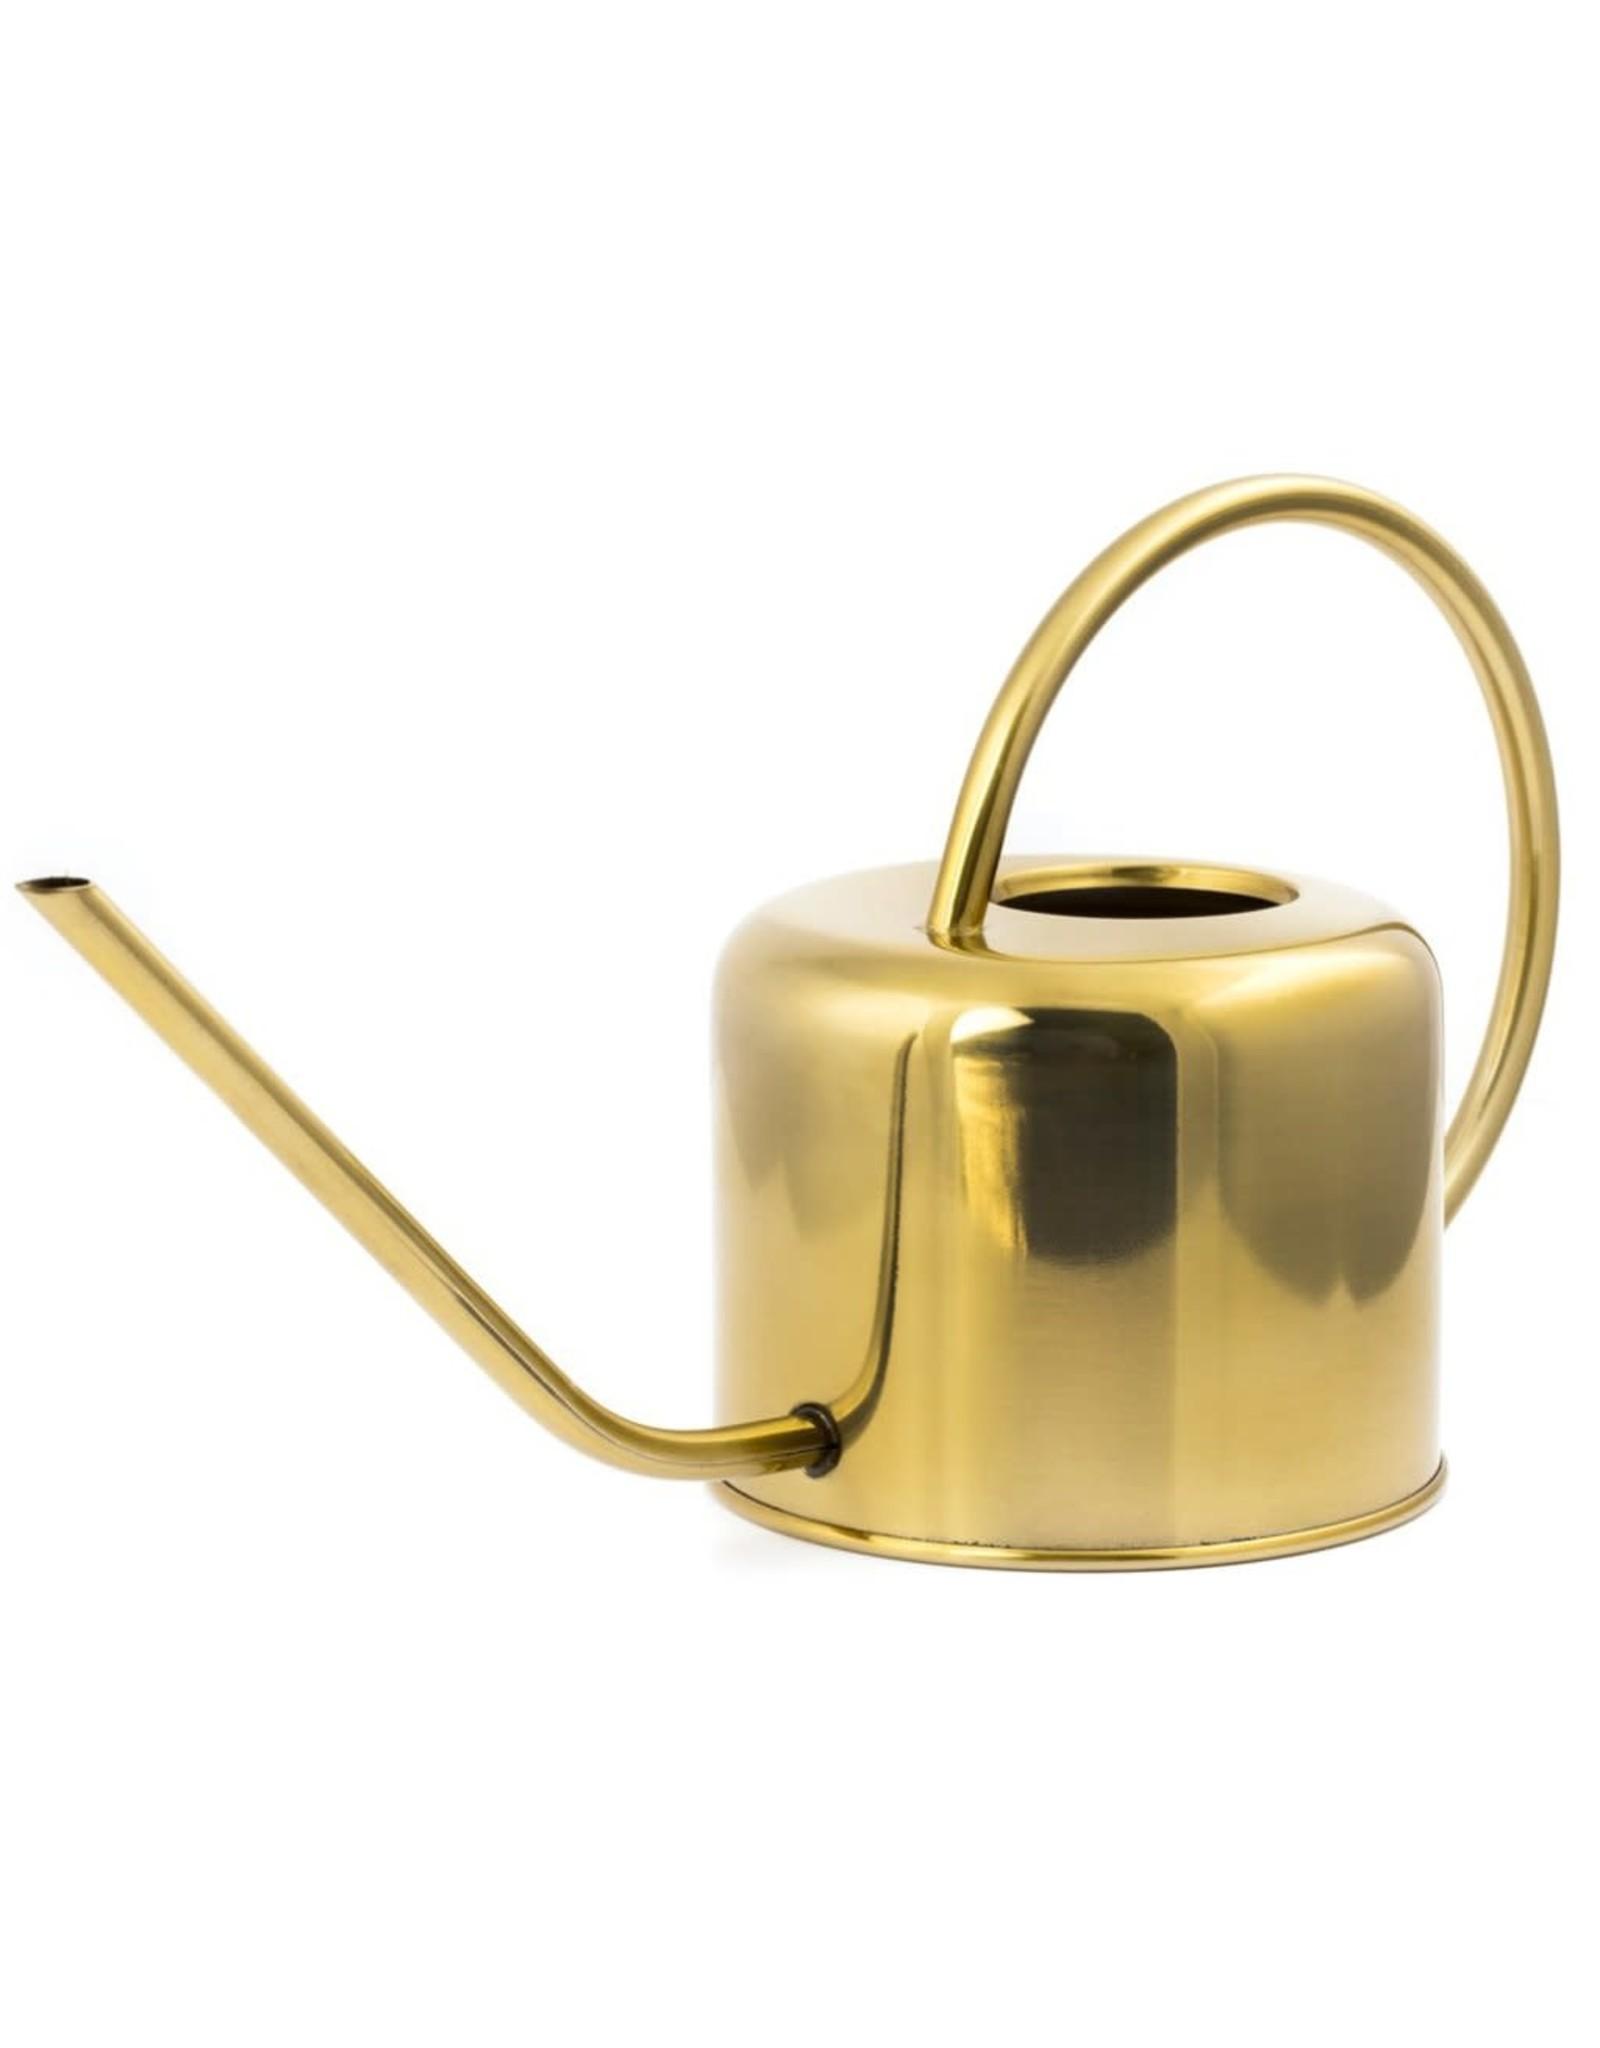 Kikkerland Vintage Brass Watering Can